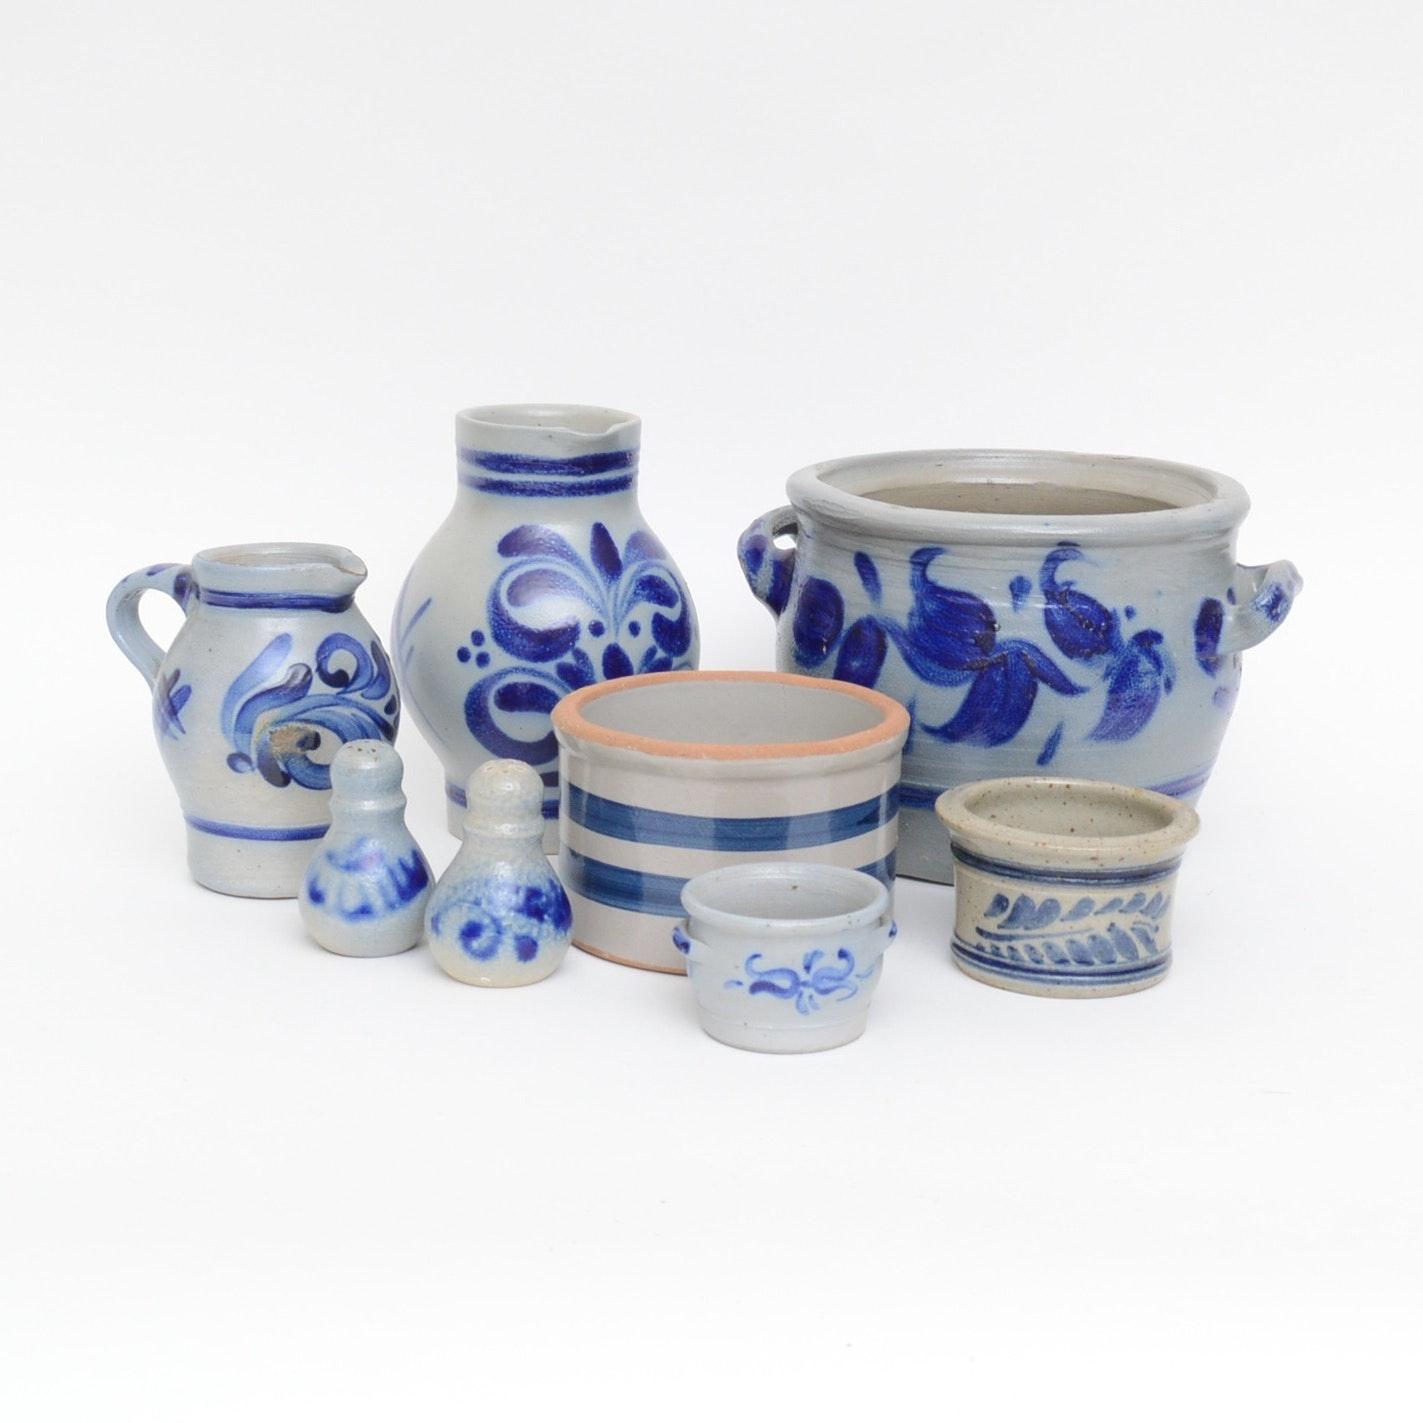 Blue Underglaze Decorated Stoneware Crocks and Serveware